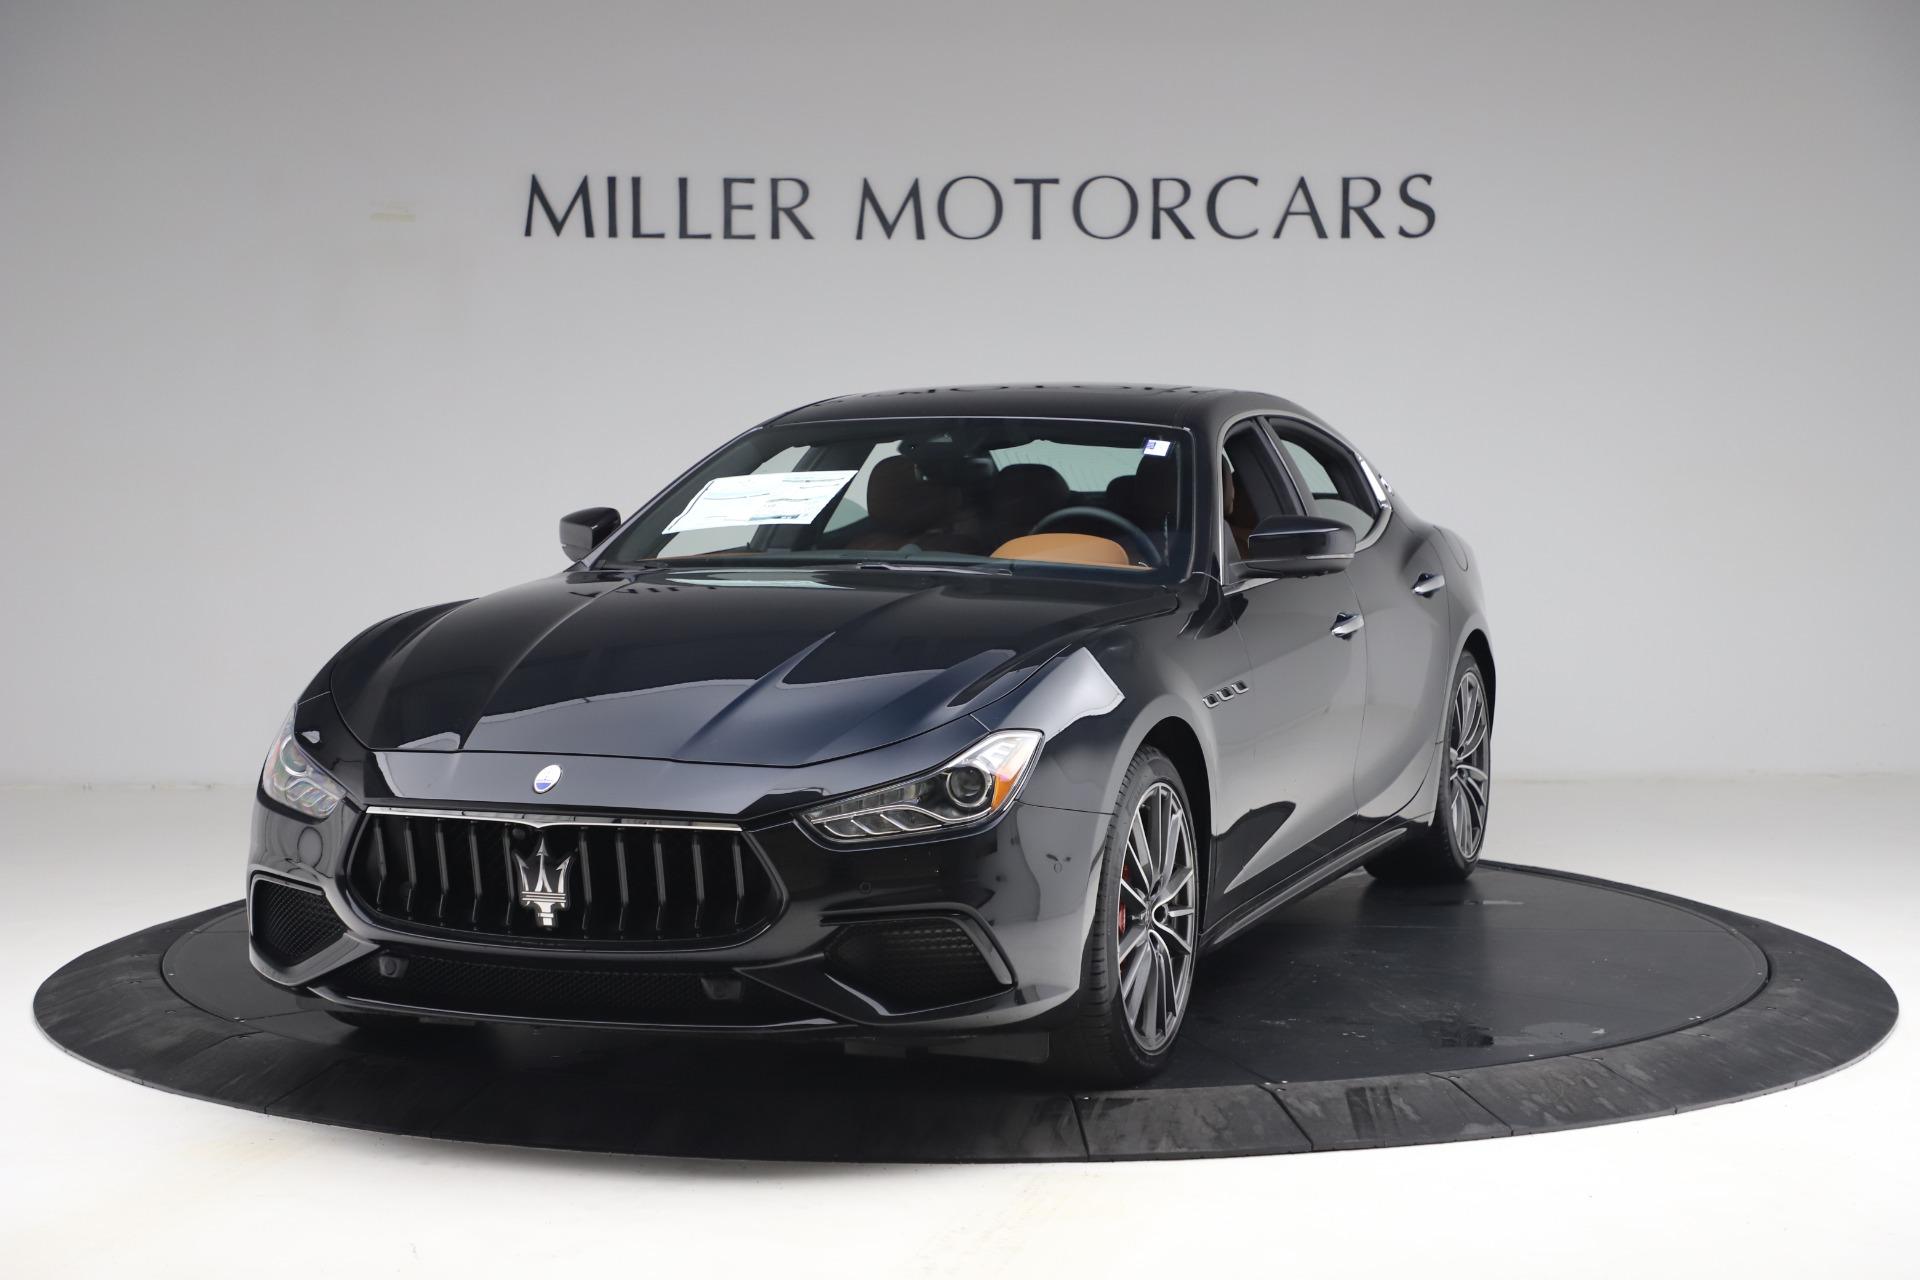 New 2021 Maserati Ghibli S Q4 for sale Call for price at Maserati of Westport in Westport CT 06880 1